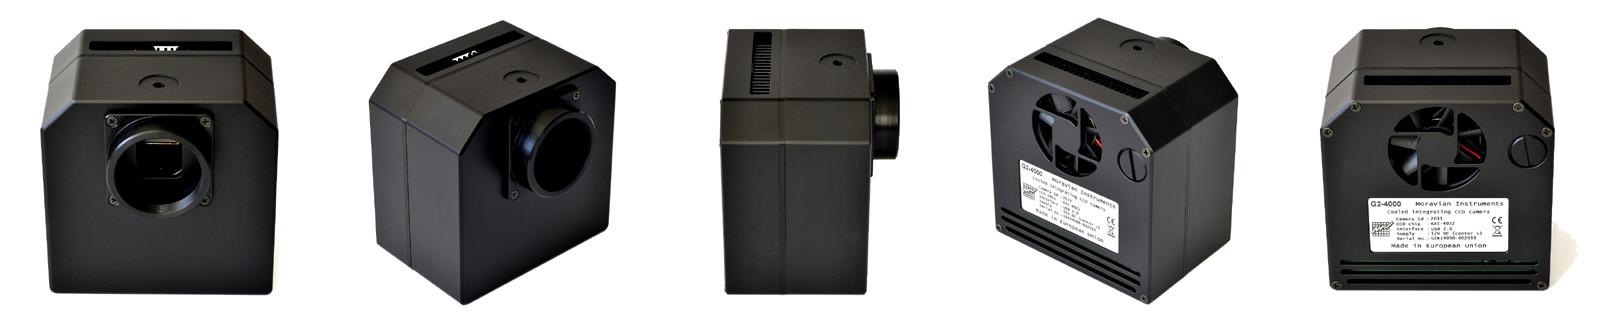 G2 CCD camera head